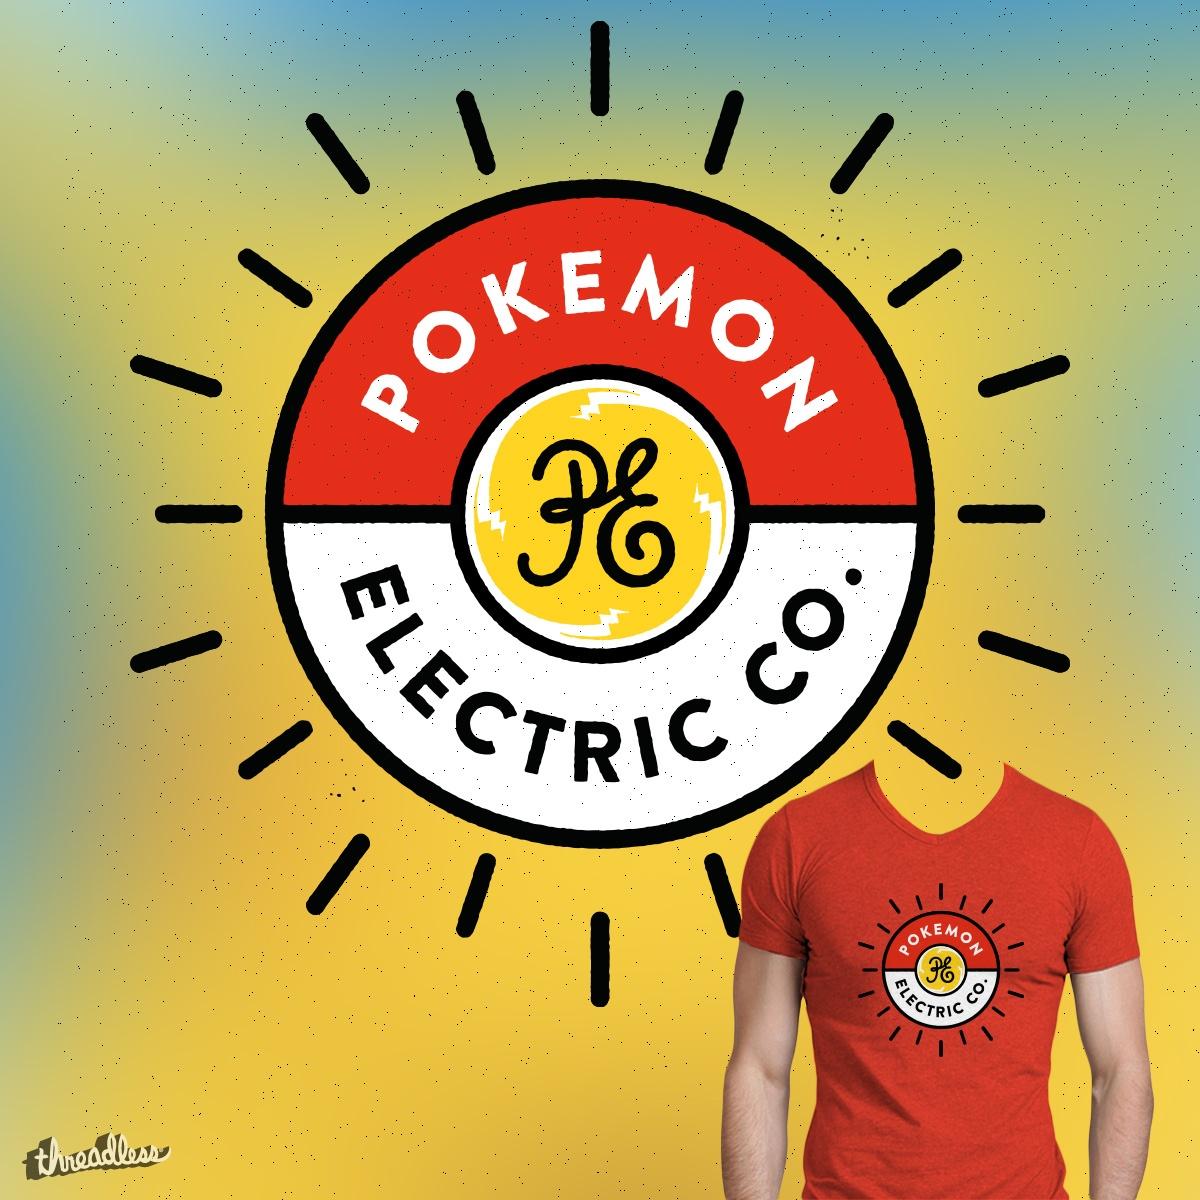 Pokemonn Electric Company by tugrulpeker on Threadless